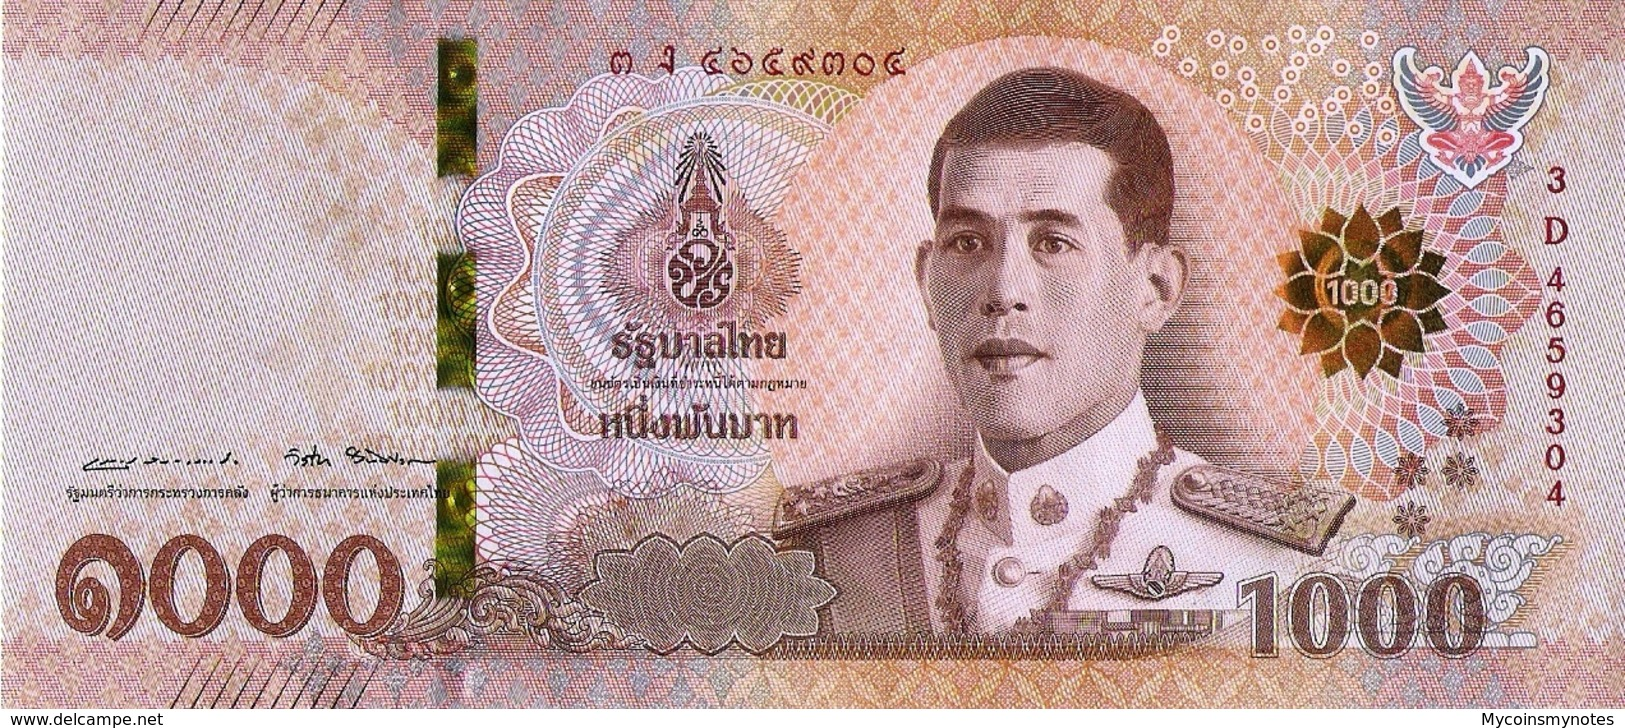 THAILAND 1000 BAHTS, 2018, P139 UNC, REI RAMA X - Thailand